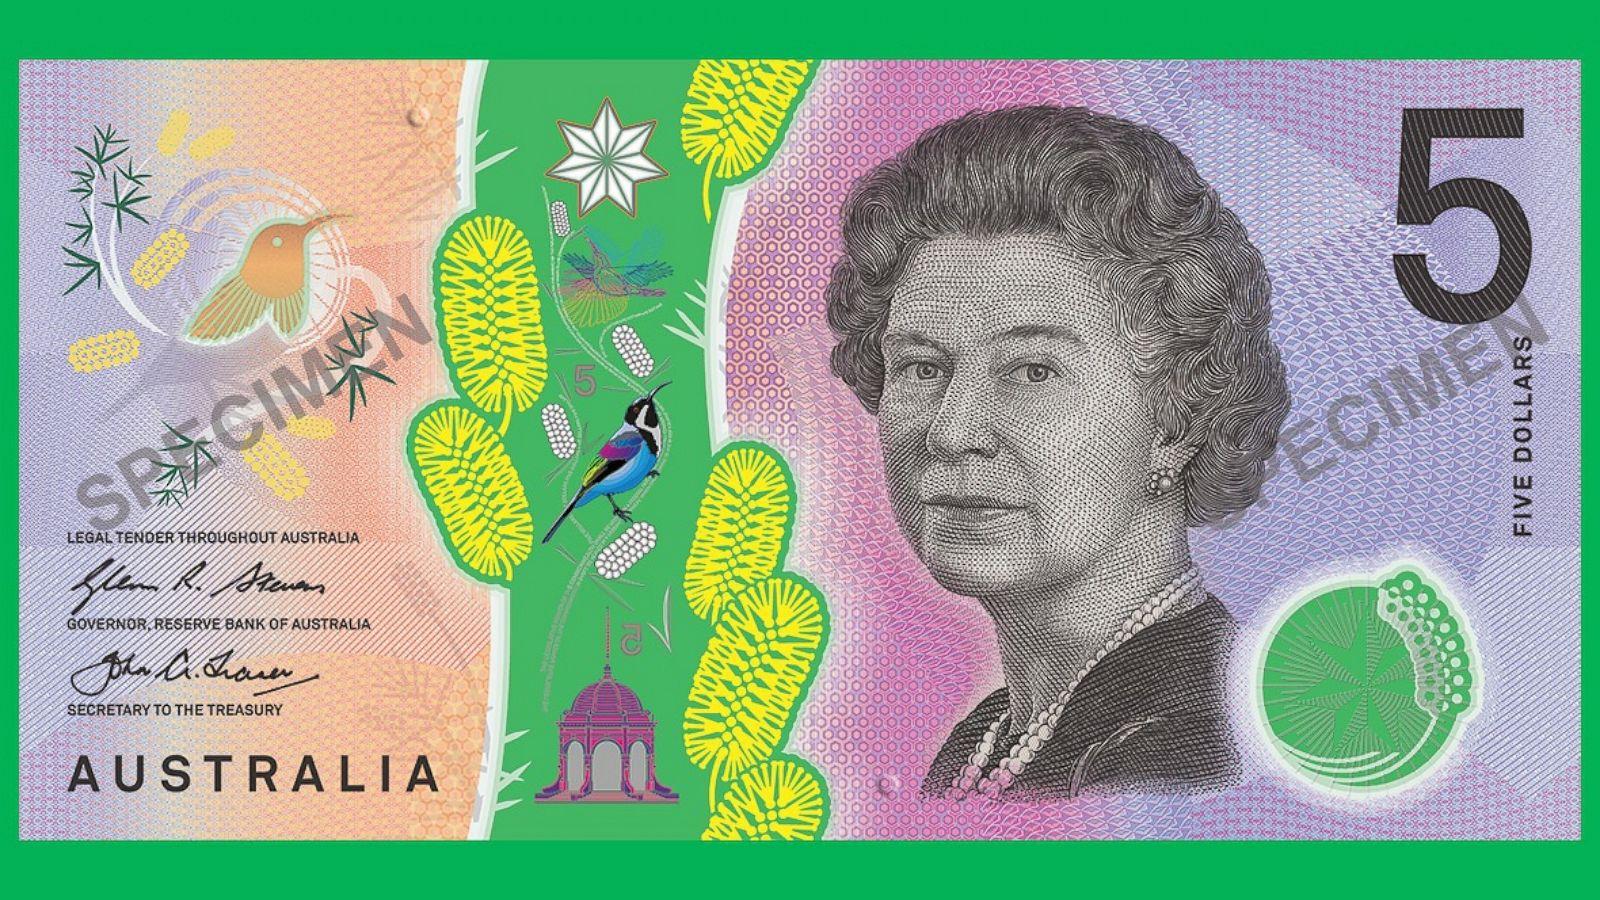 New Australian 5 Bill Design Sparks The Latest